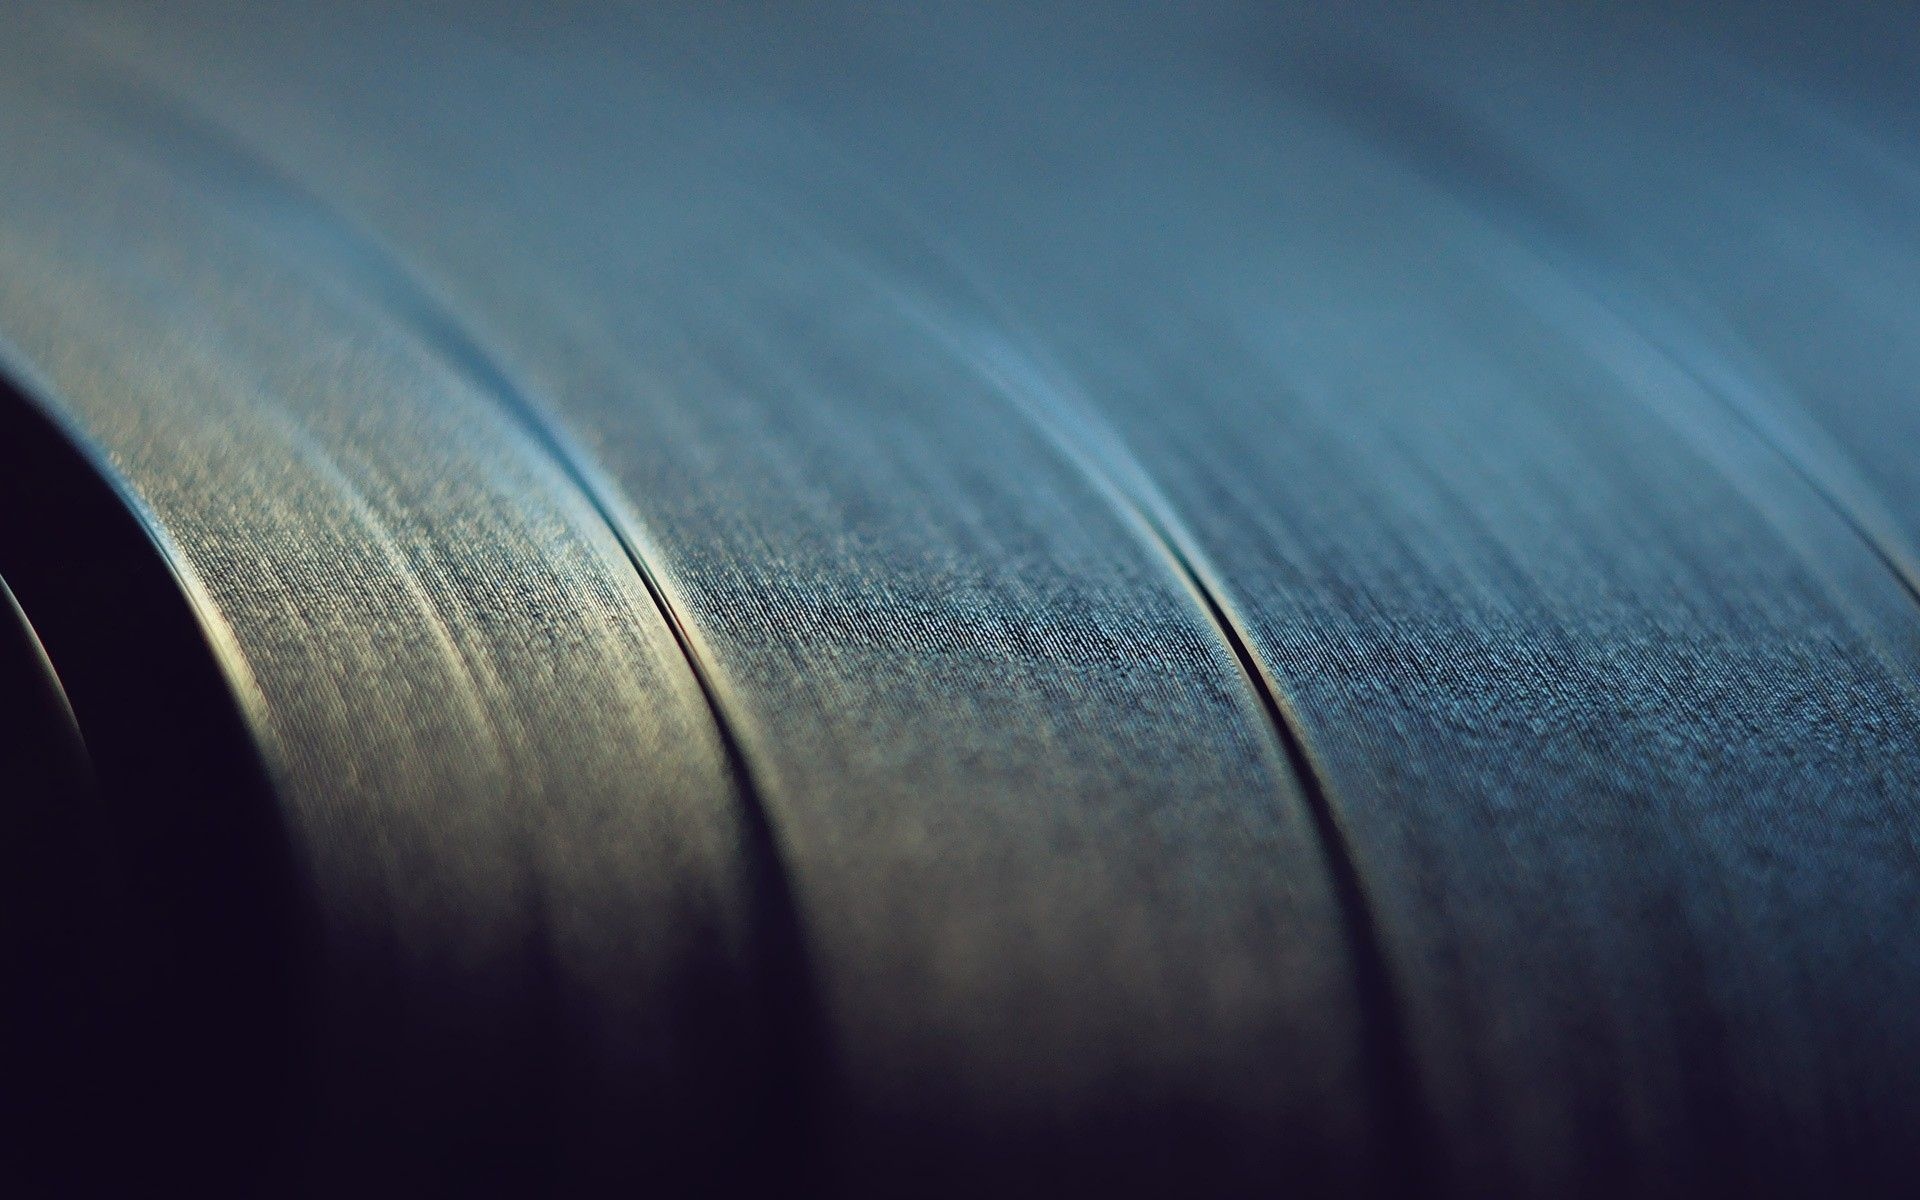 macro minimalistic music record album simple wallpaper